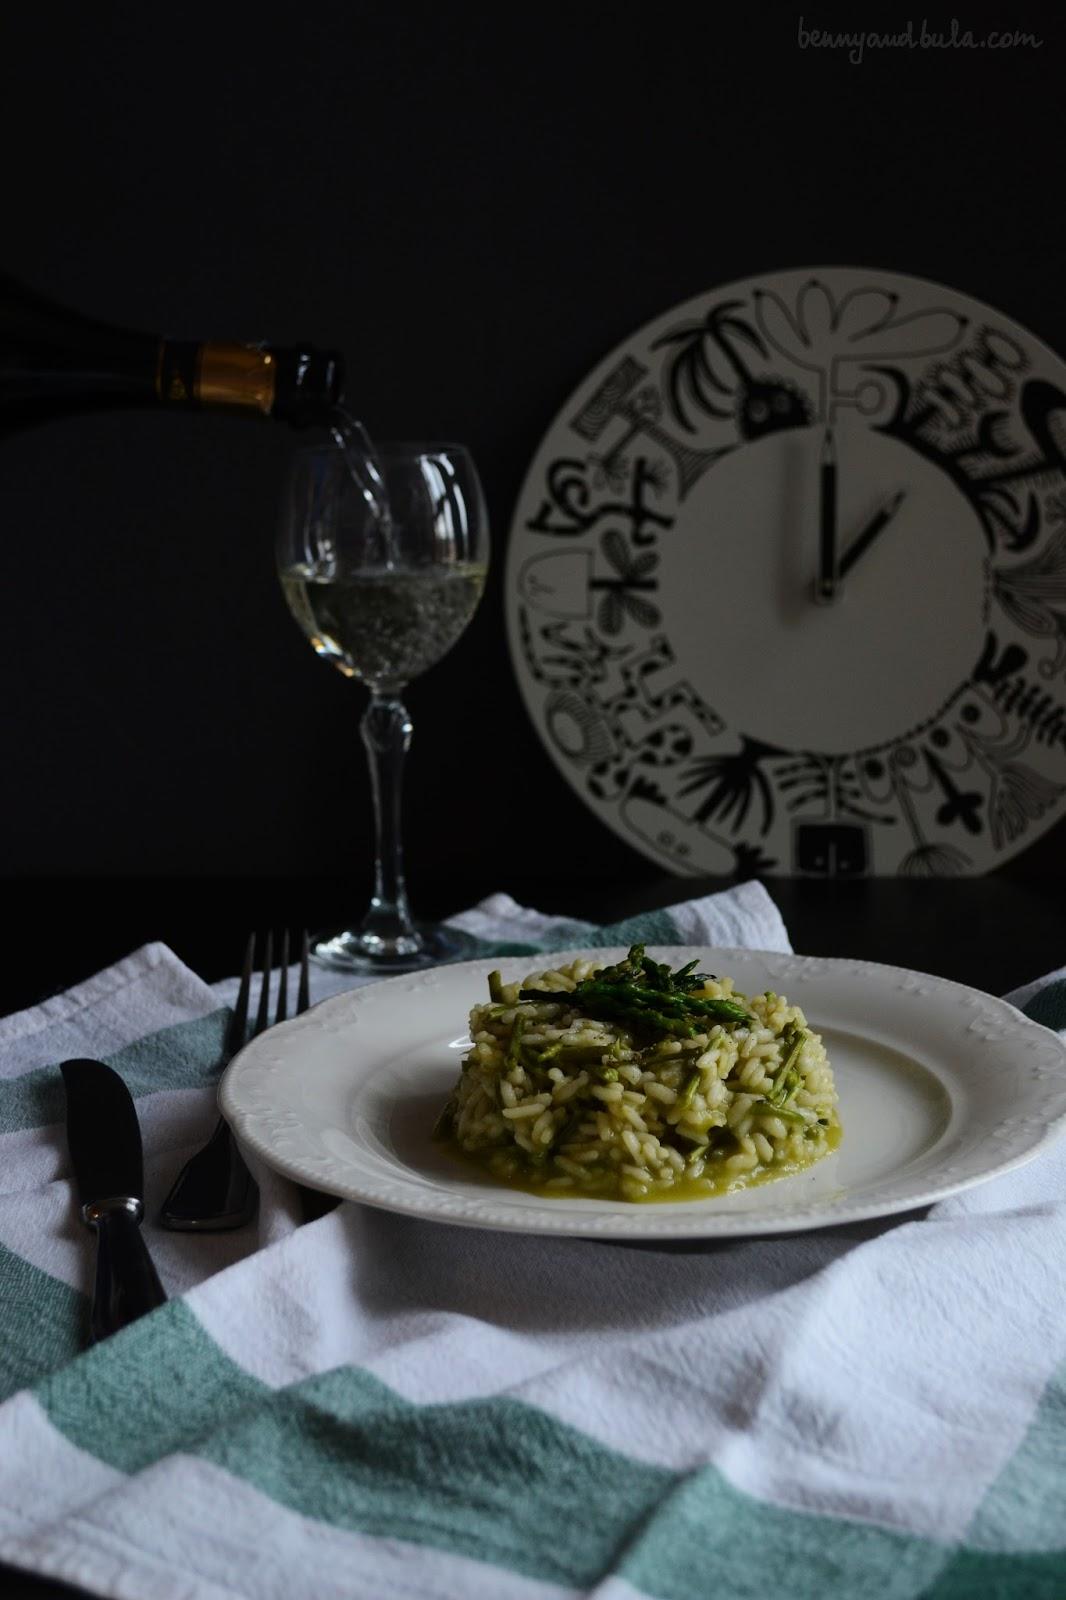 risotto asparagi selvatici/ wild asparagus rice